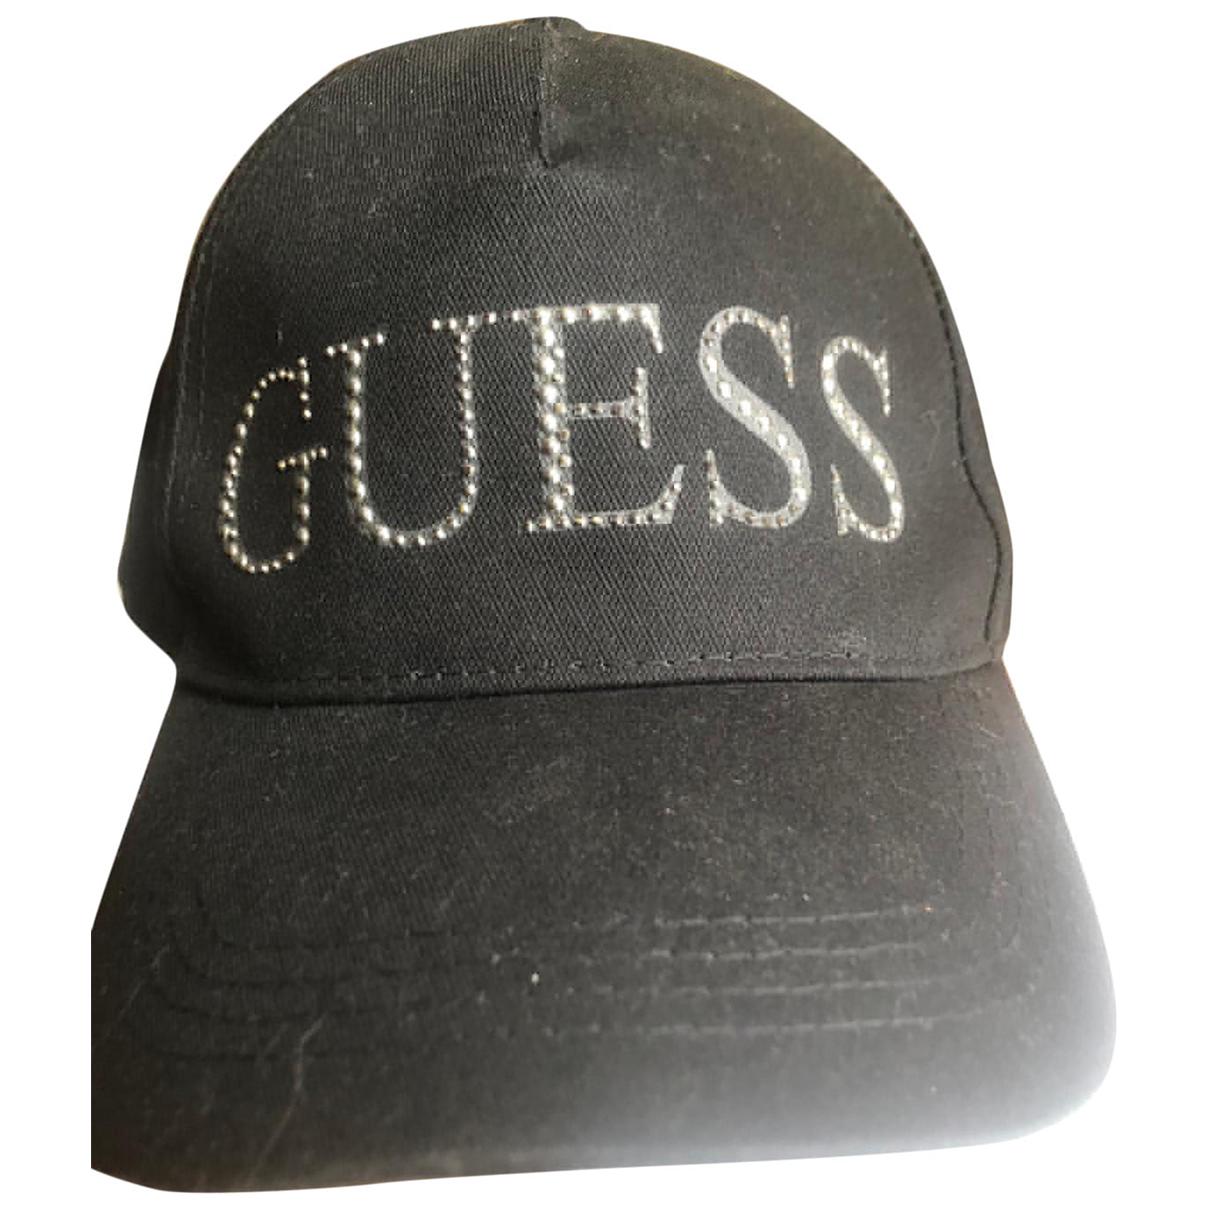 Guess \N Black hat for Women M International